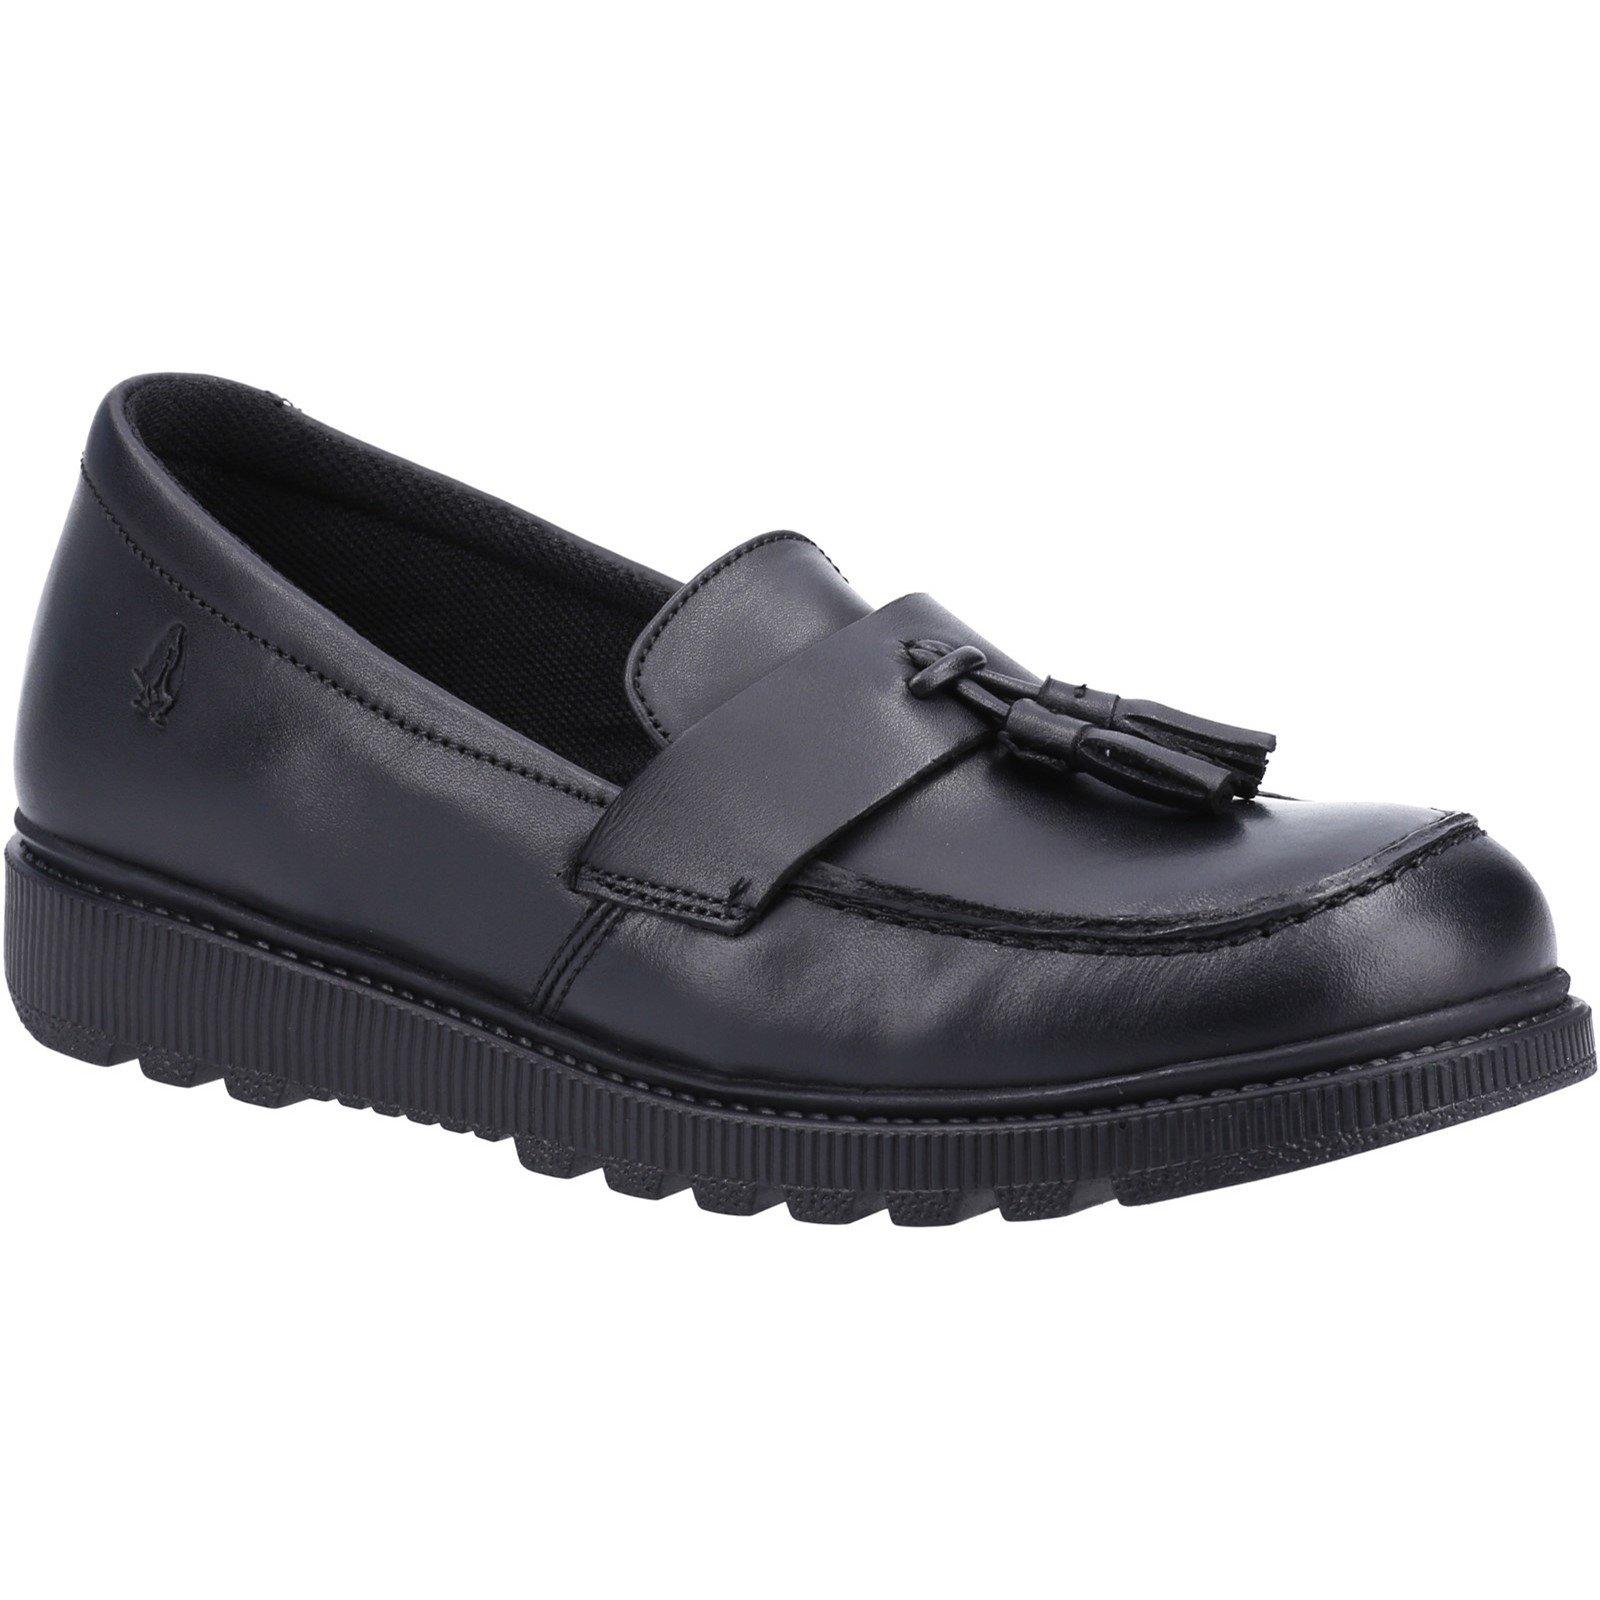 Hush Puppies Kid's Faye Junior School Shoe Black 30843 - Black 10